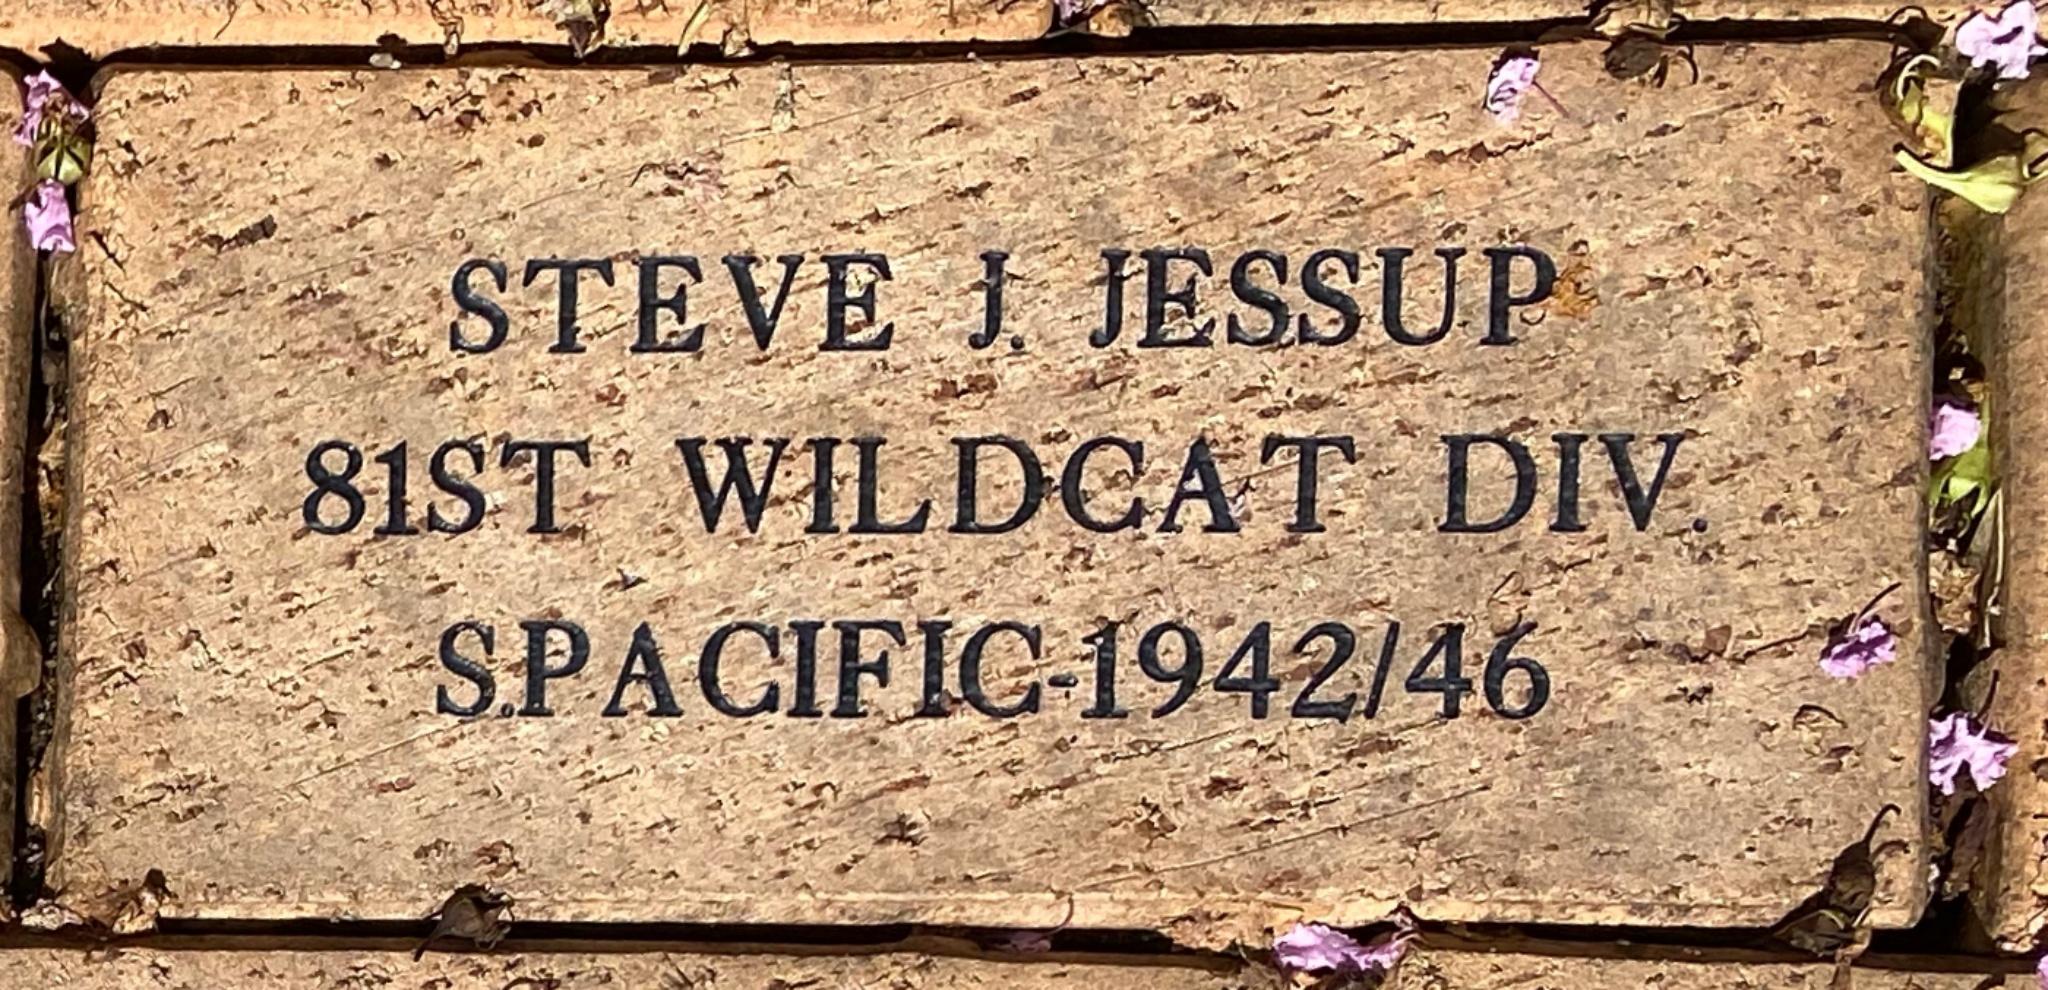 STEVE J. JESSUP 81ST WILDCAT DIV. S. PACIFIC-1942/46